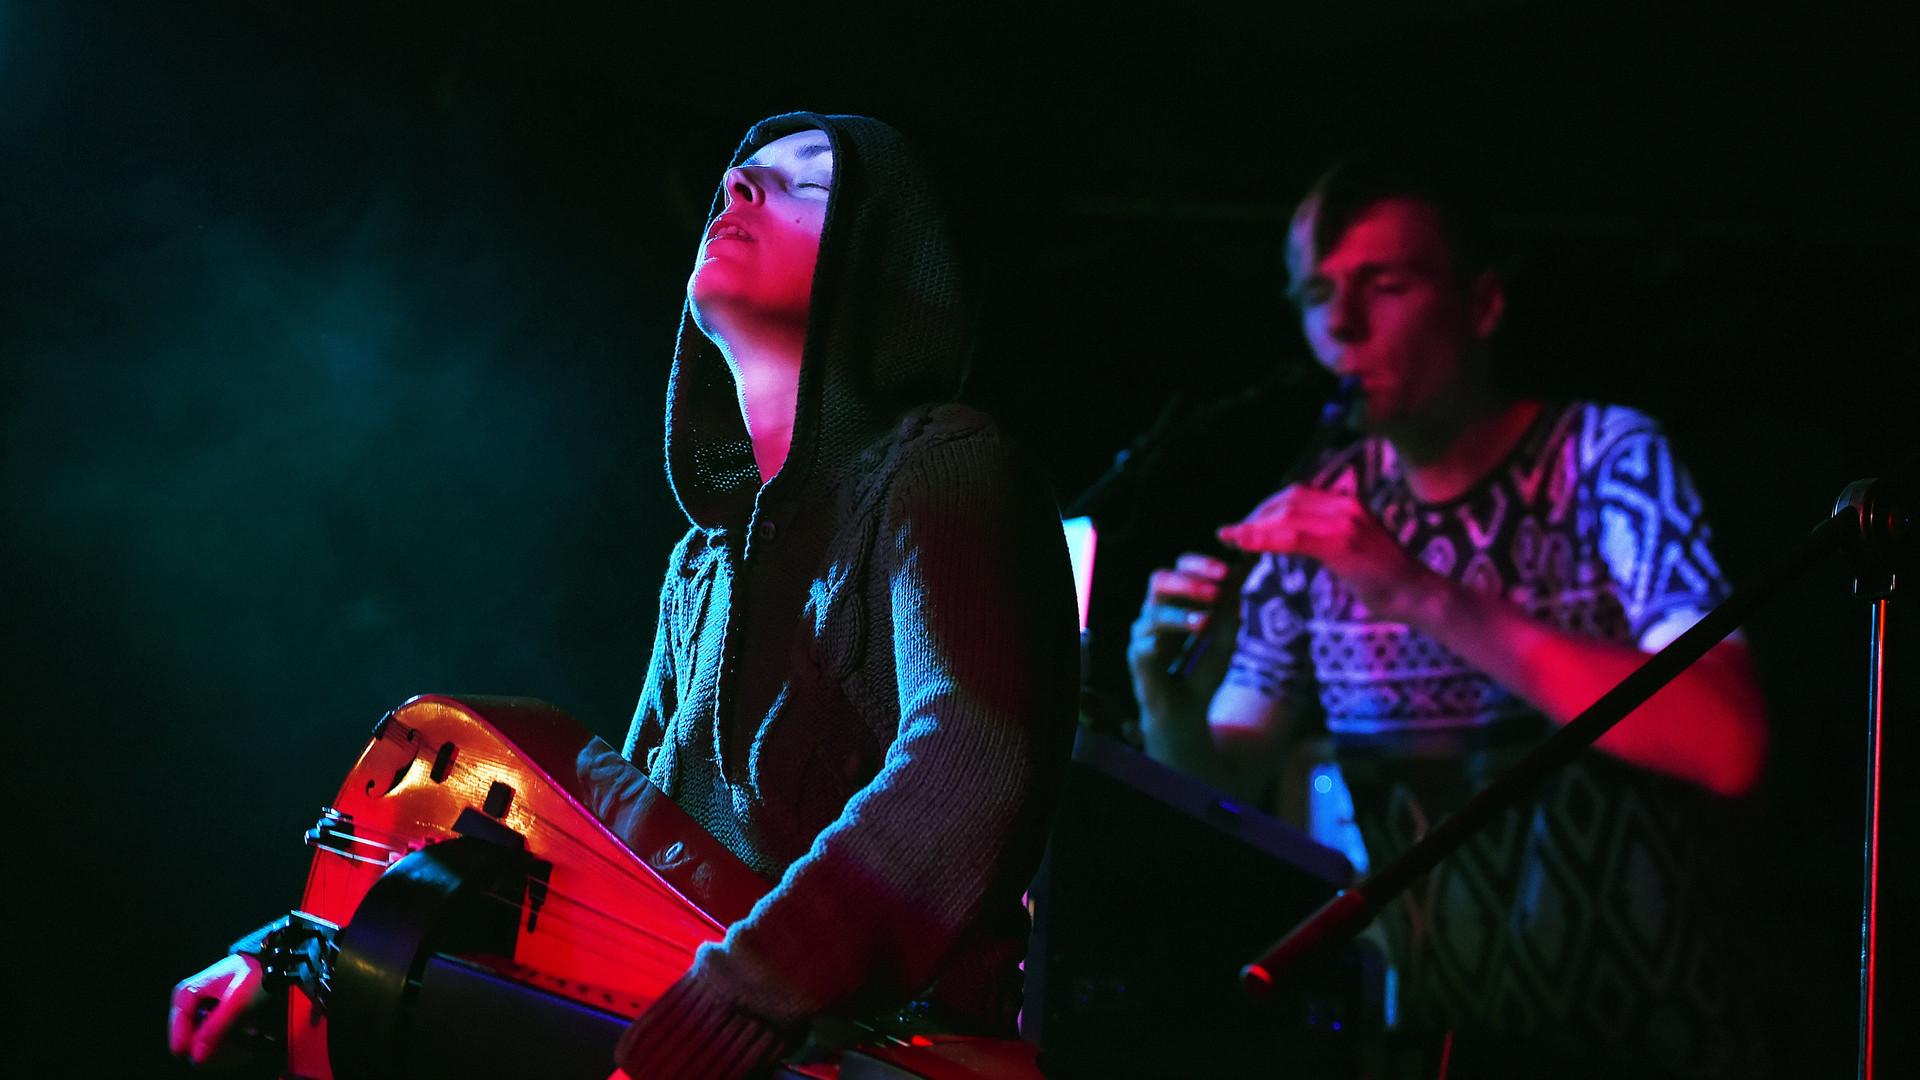 Live at Aatma, Manchester